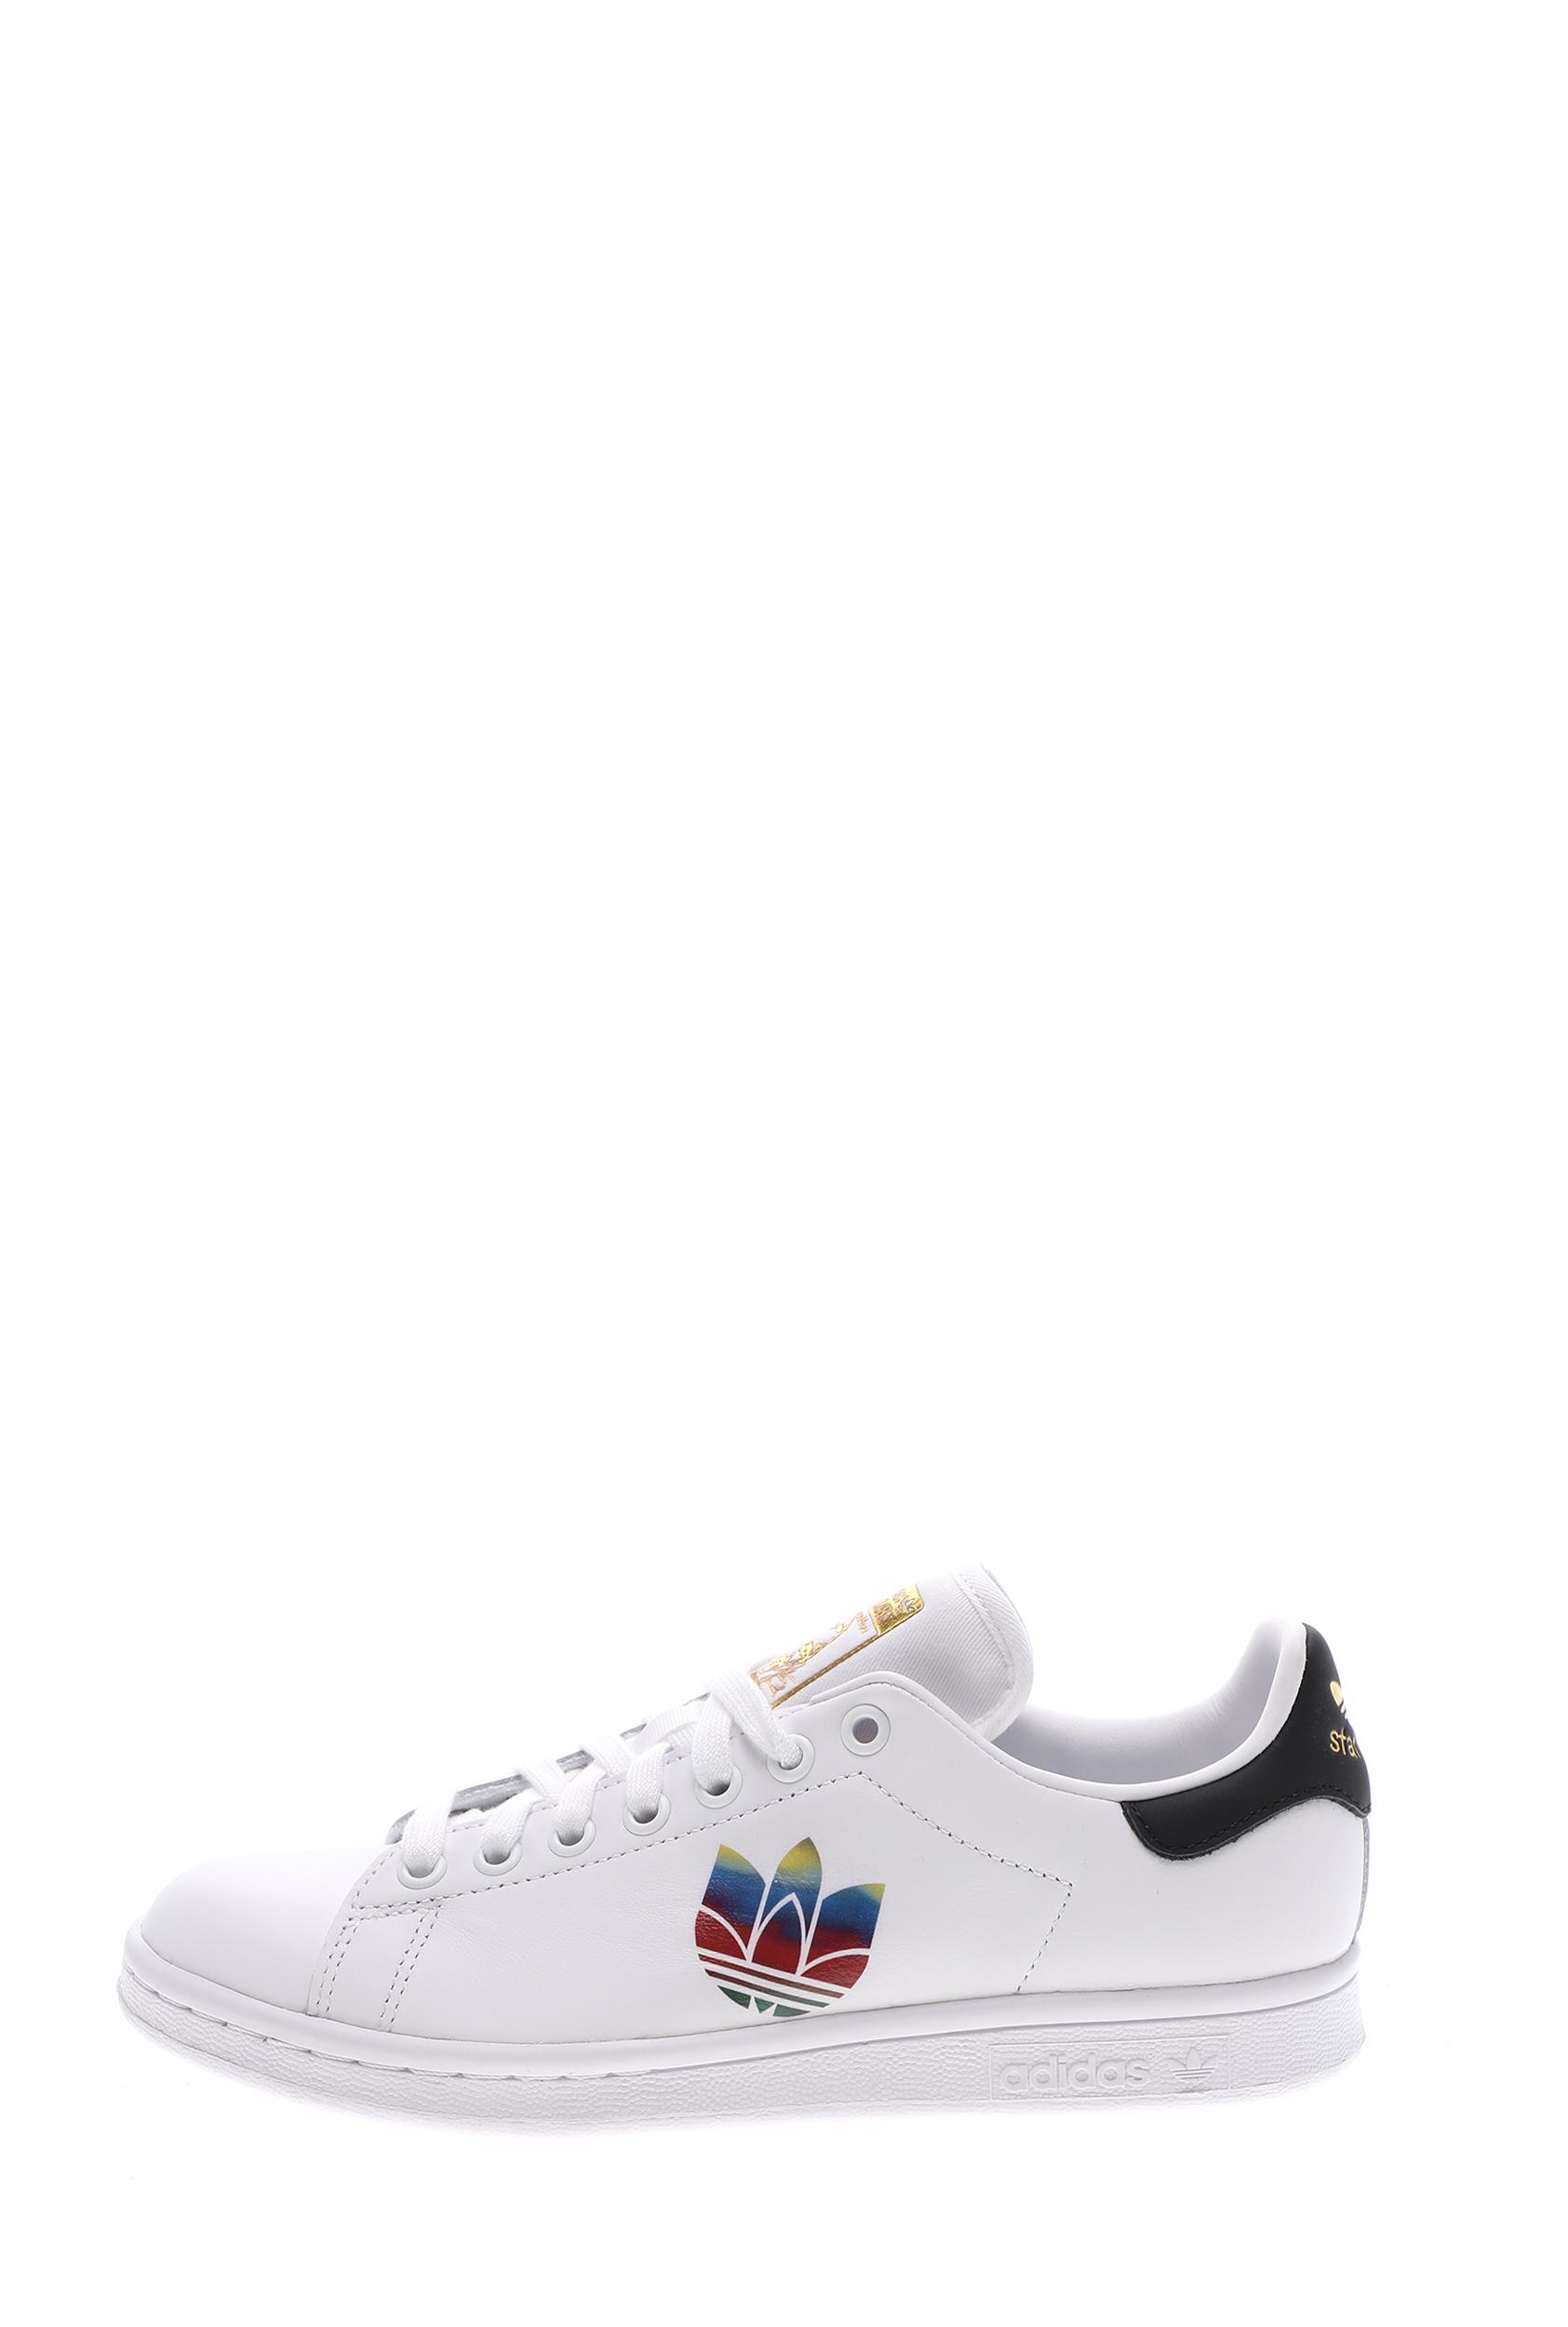 adidas Originals - Γυναικεία sneakers adidas Originals FW2443 STAN SMITH W λευκά